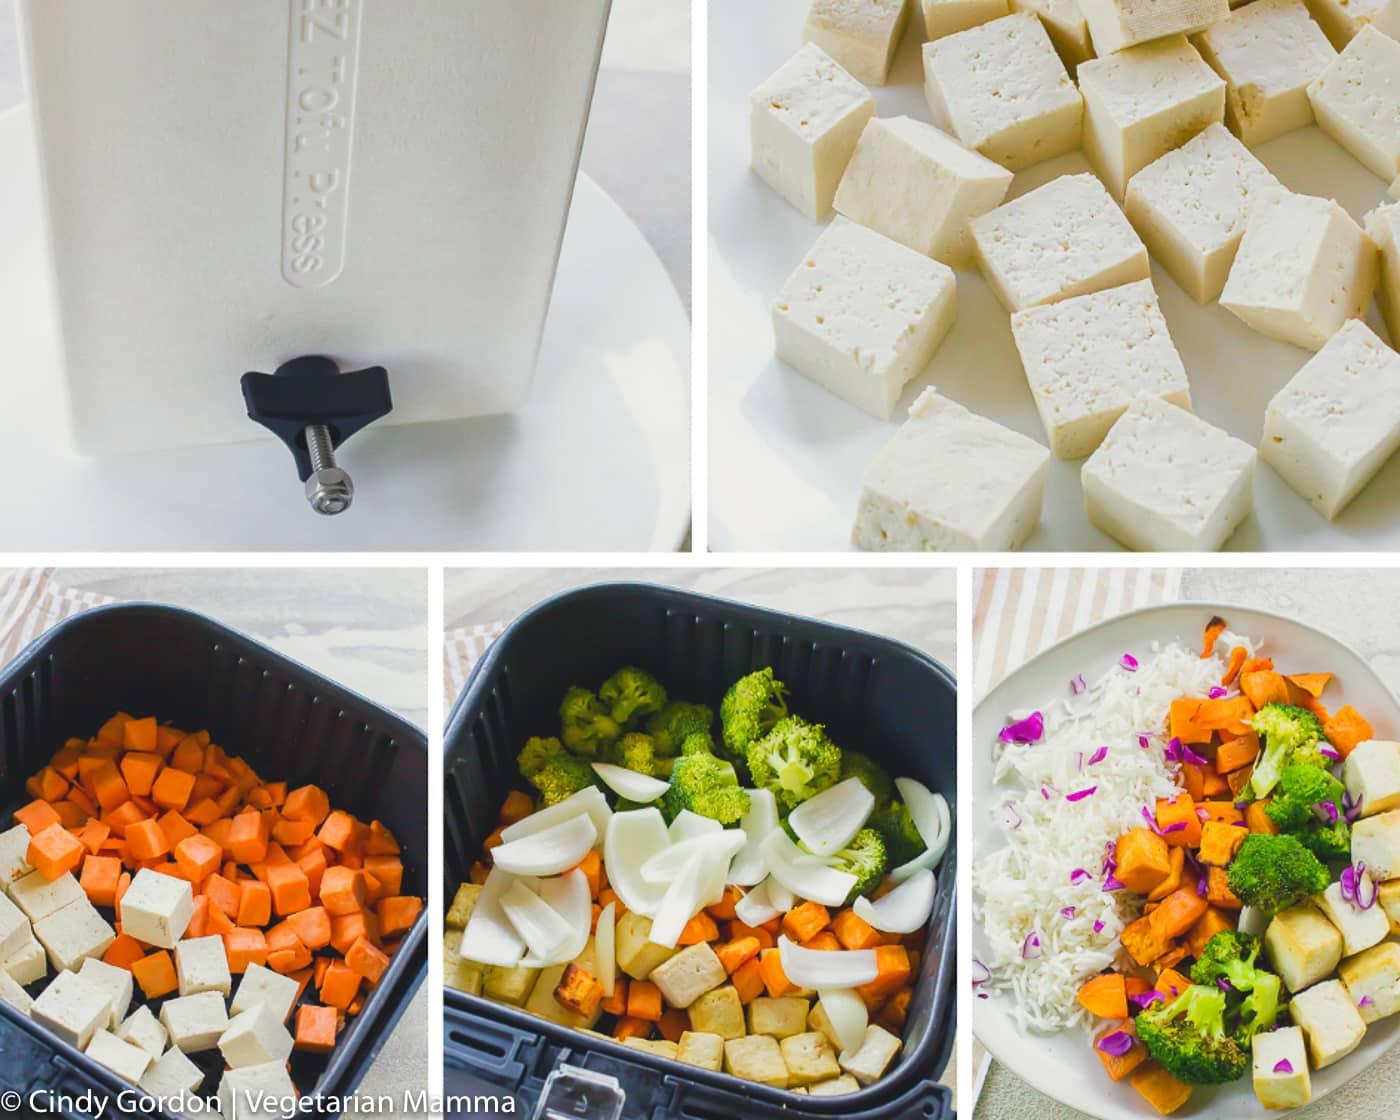 Collage of inprocess shots to make sweet potato bowls